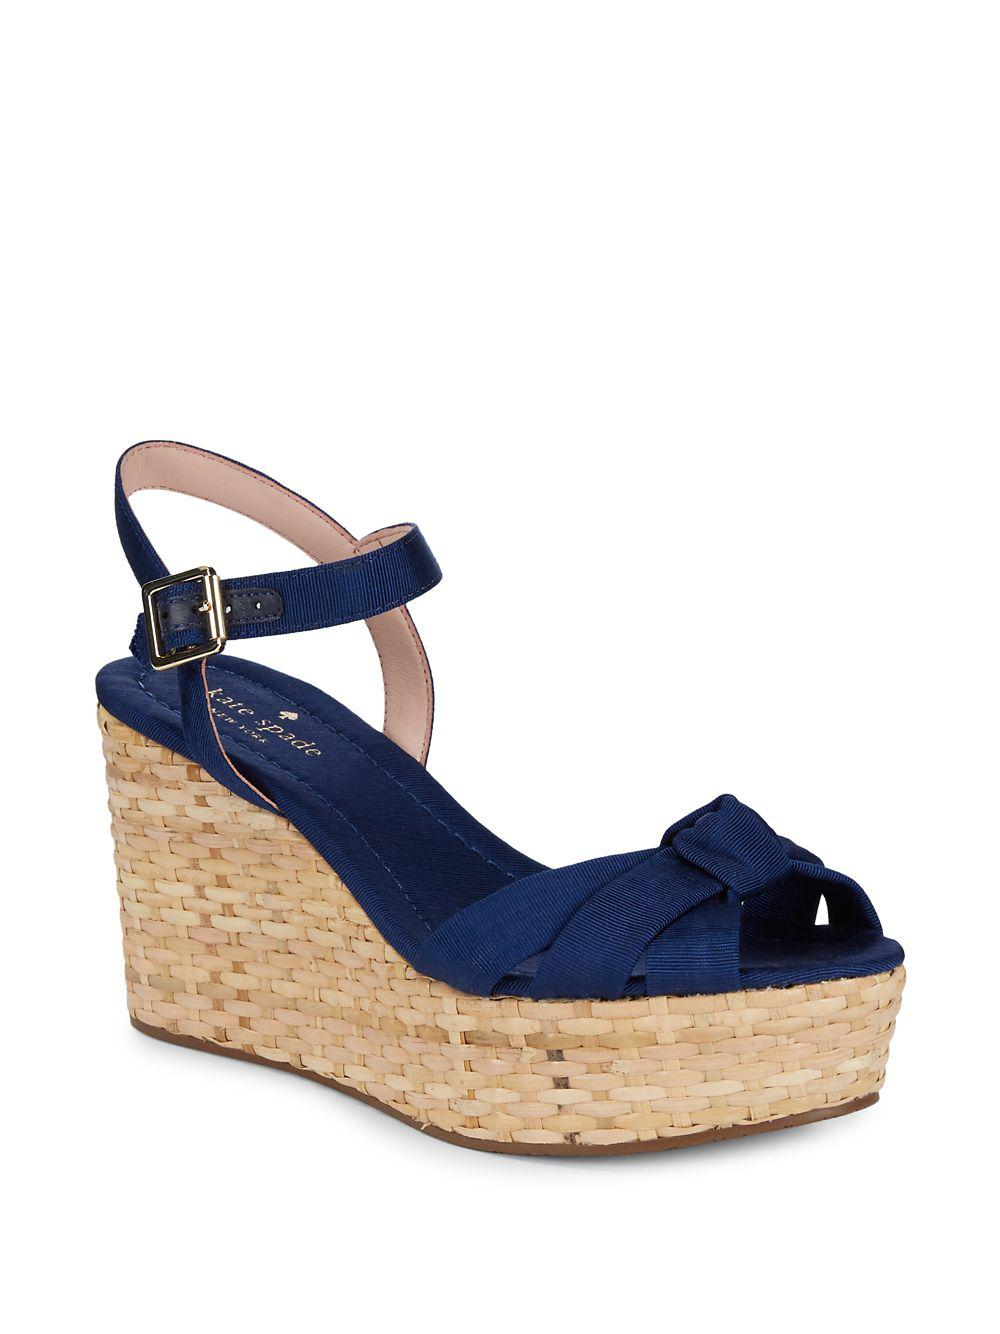 d799267b751 Kate Spade Tilly Basket-weave Wedge Sandals in Blue - Lyst